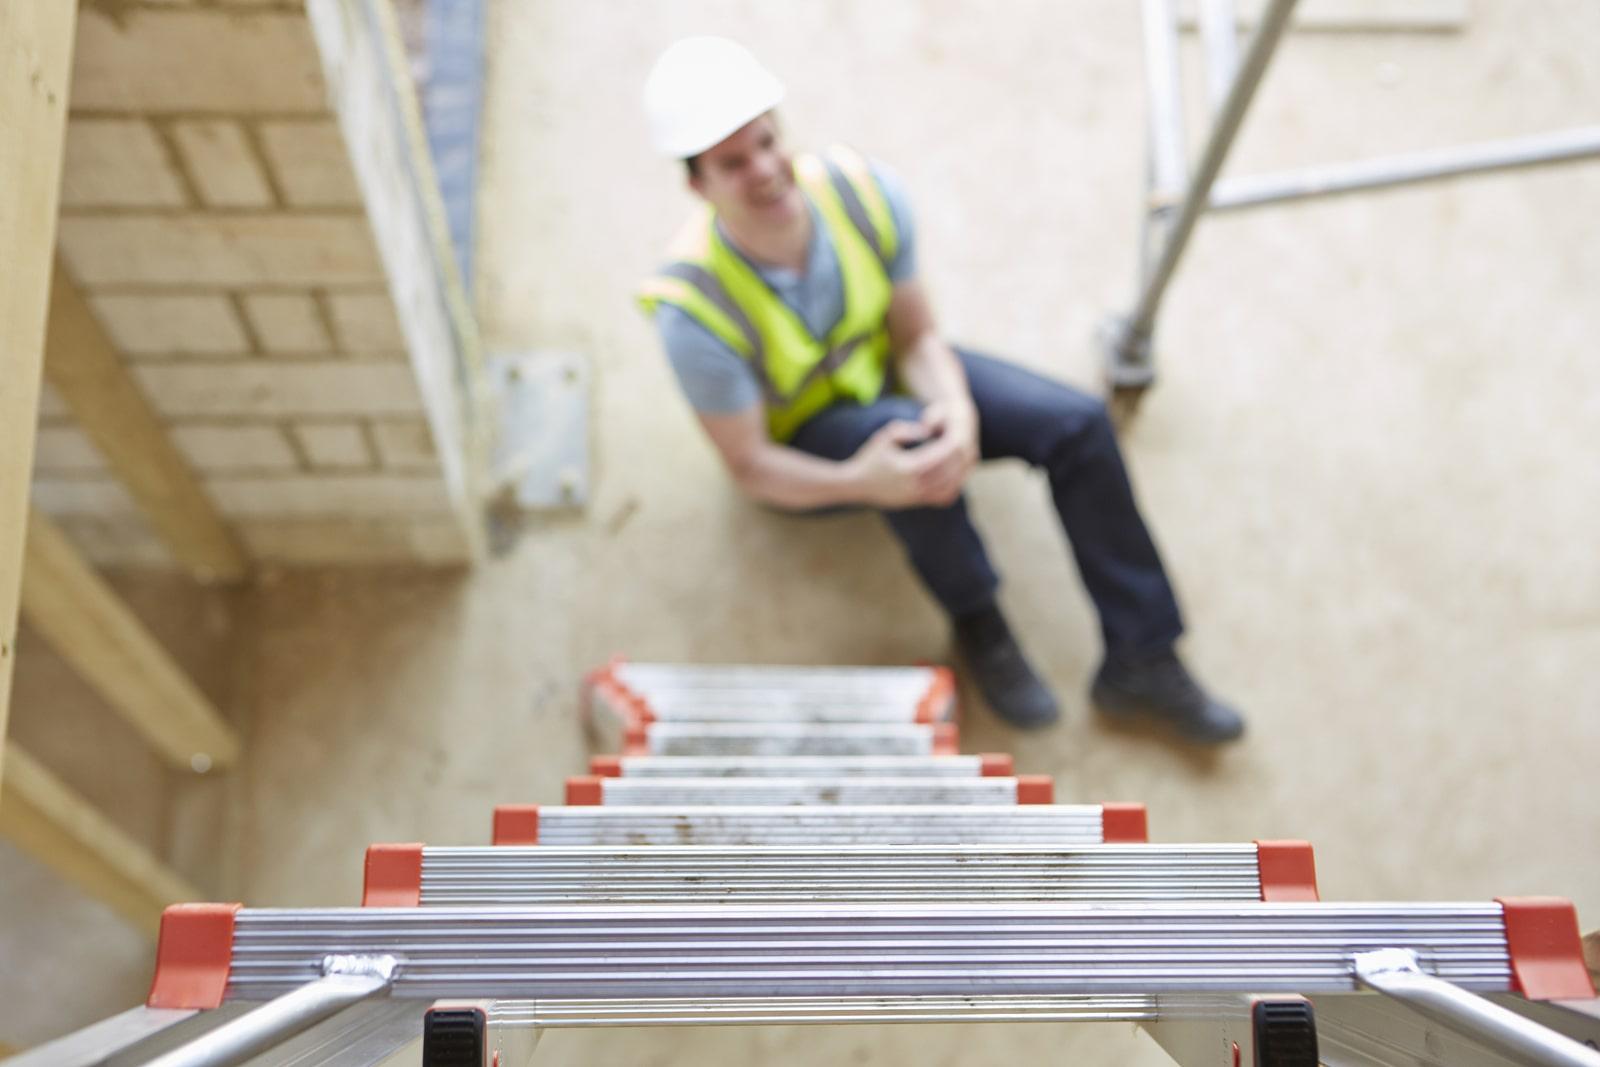 arlington construction accident lawyer